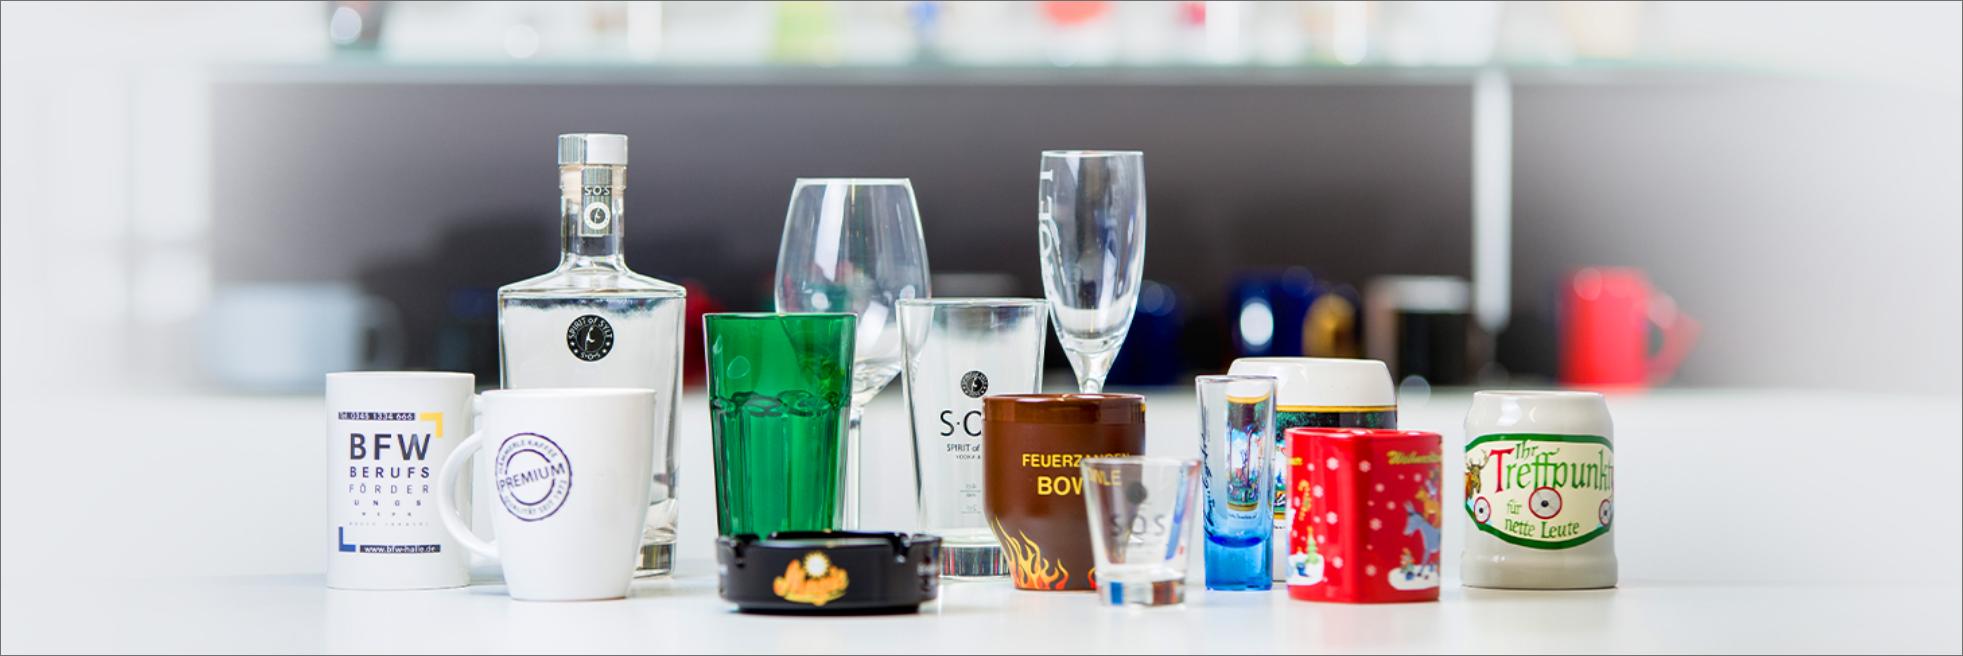 Produktdesign, Glas Design, Gläser bedrucken, Gläser Druck